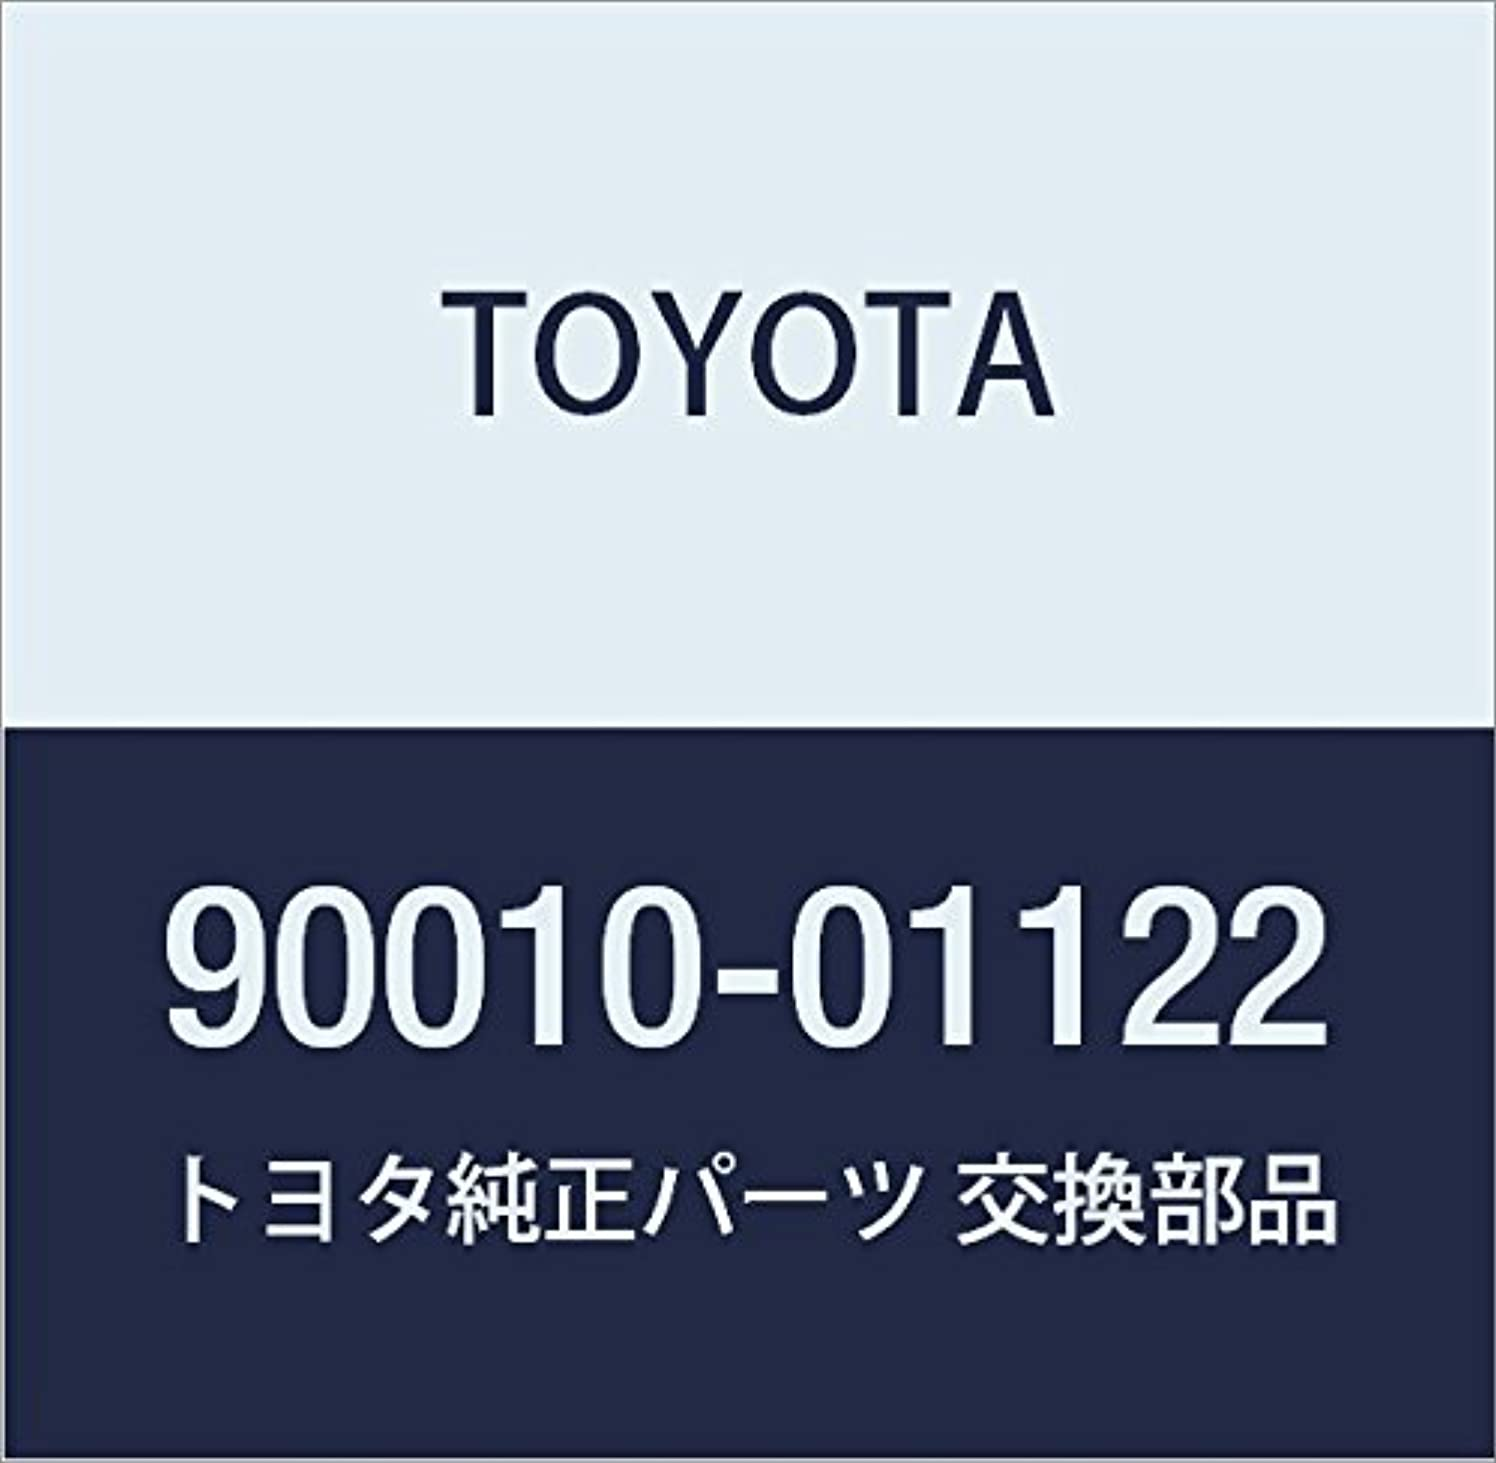 Toyota 90010-01122 Air Conditioner Control Bulb